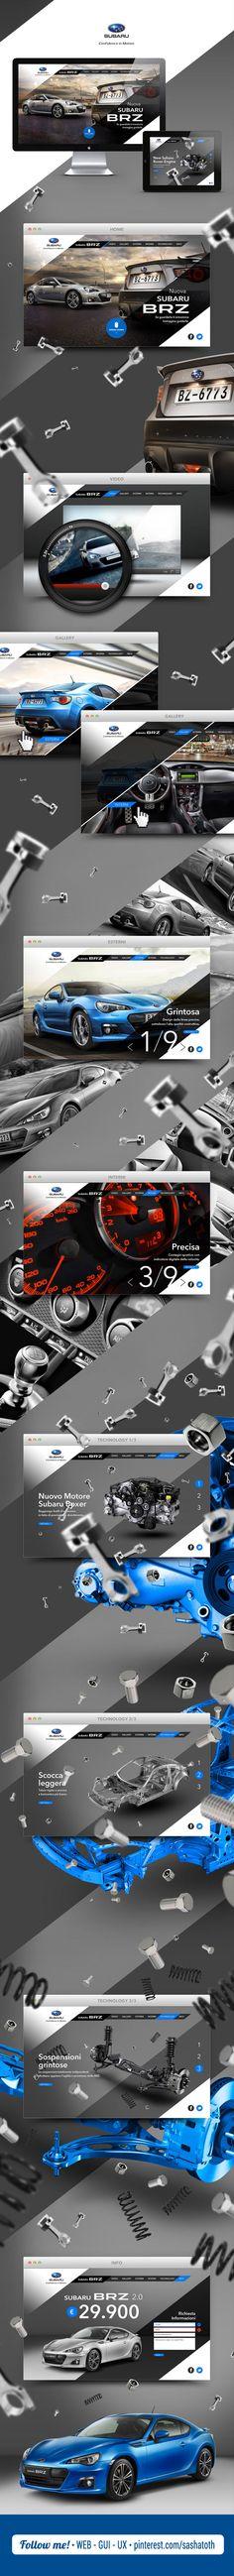 Subaru BRZ Website by Fabio Minerva, via Behance *** #web #design #behance